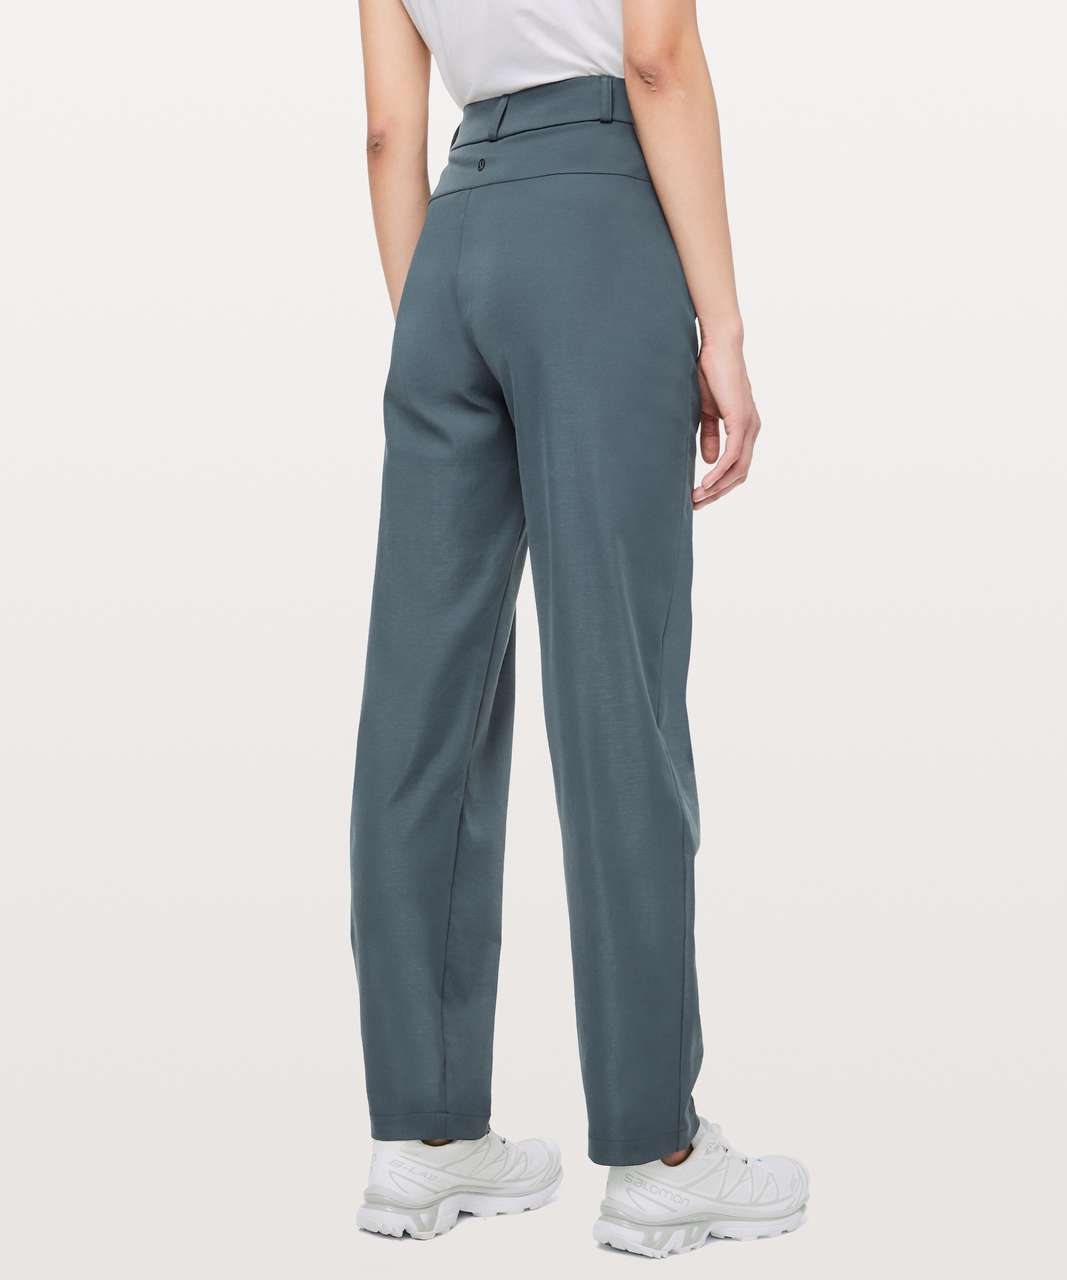 Lululemon Lab Trouser *lululemon lab - Gravity